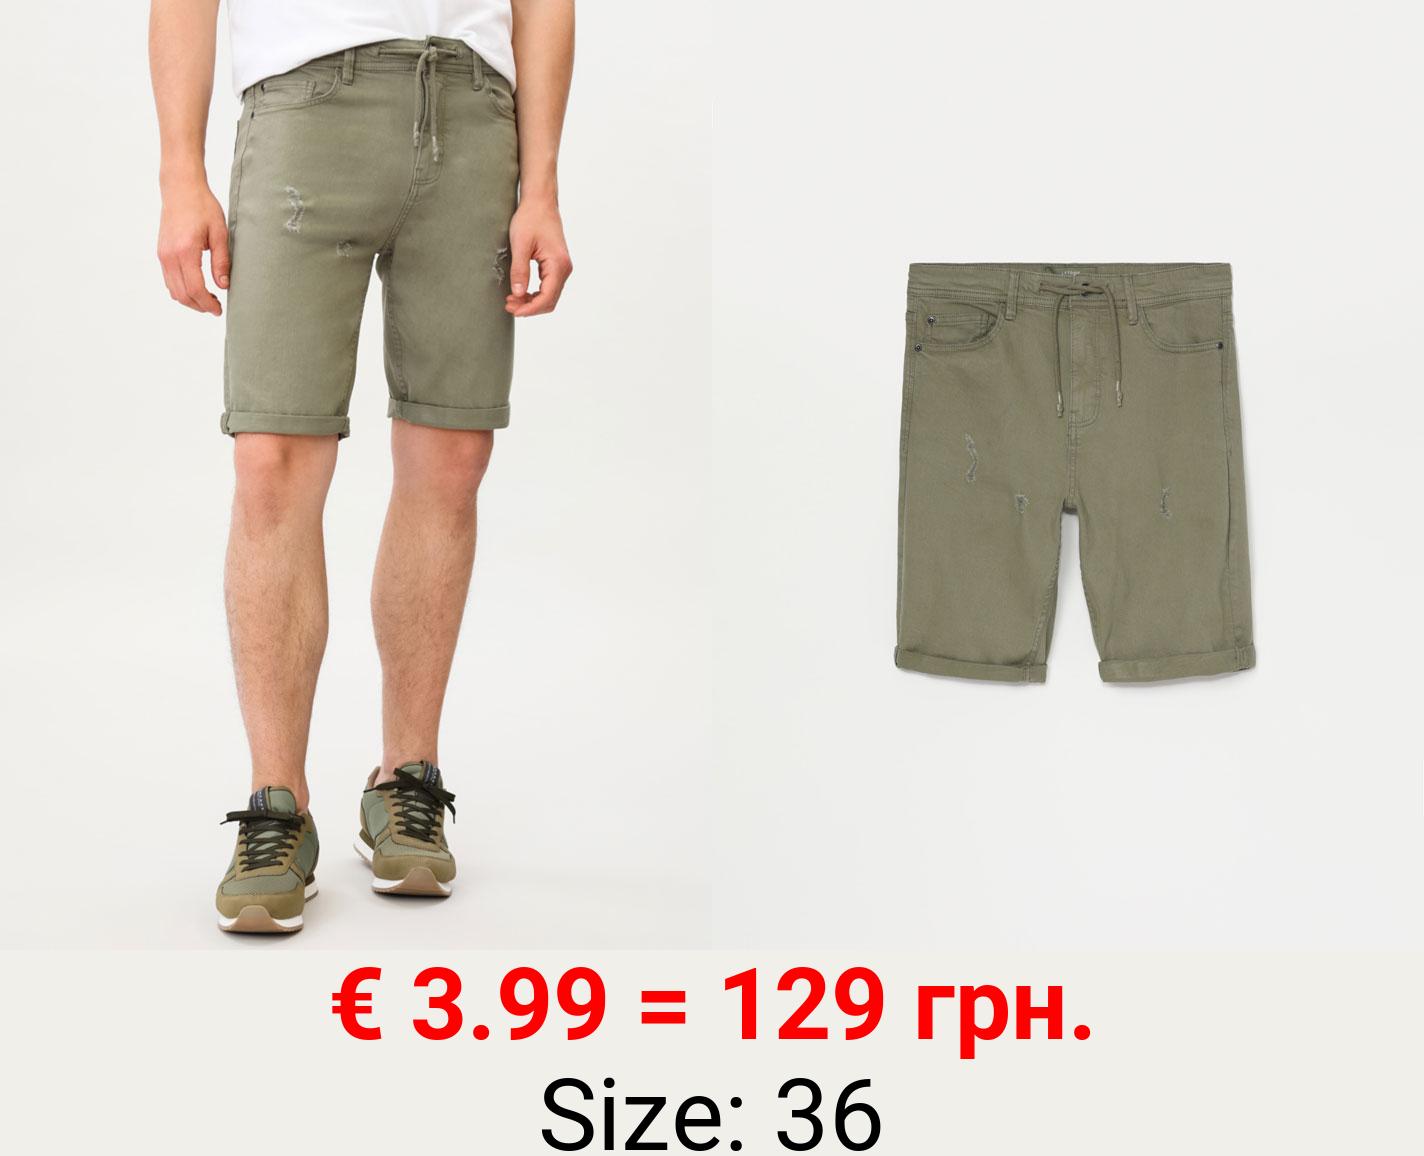 Skinny Colourful Bermuda Shorts